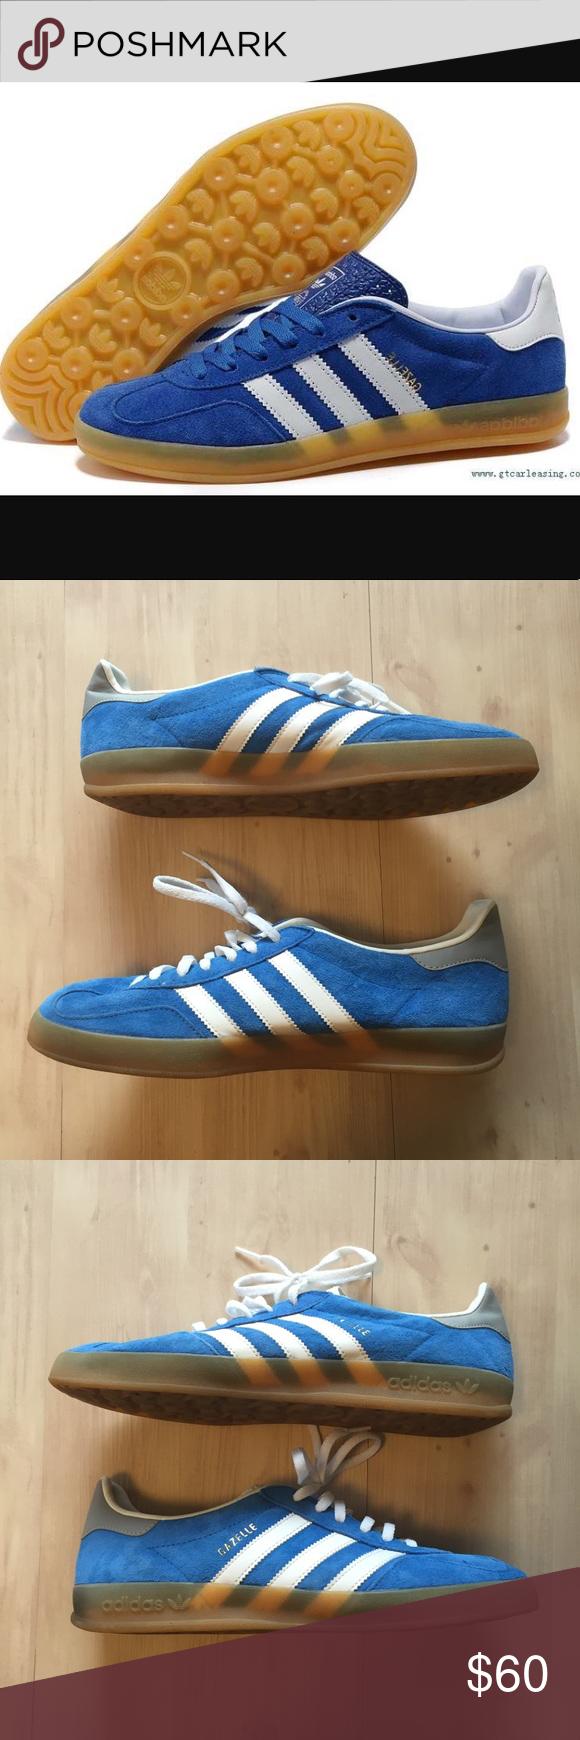 Adidas gazzella Uomo scamosciato blu / bianco sz nwob adidas gazzella